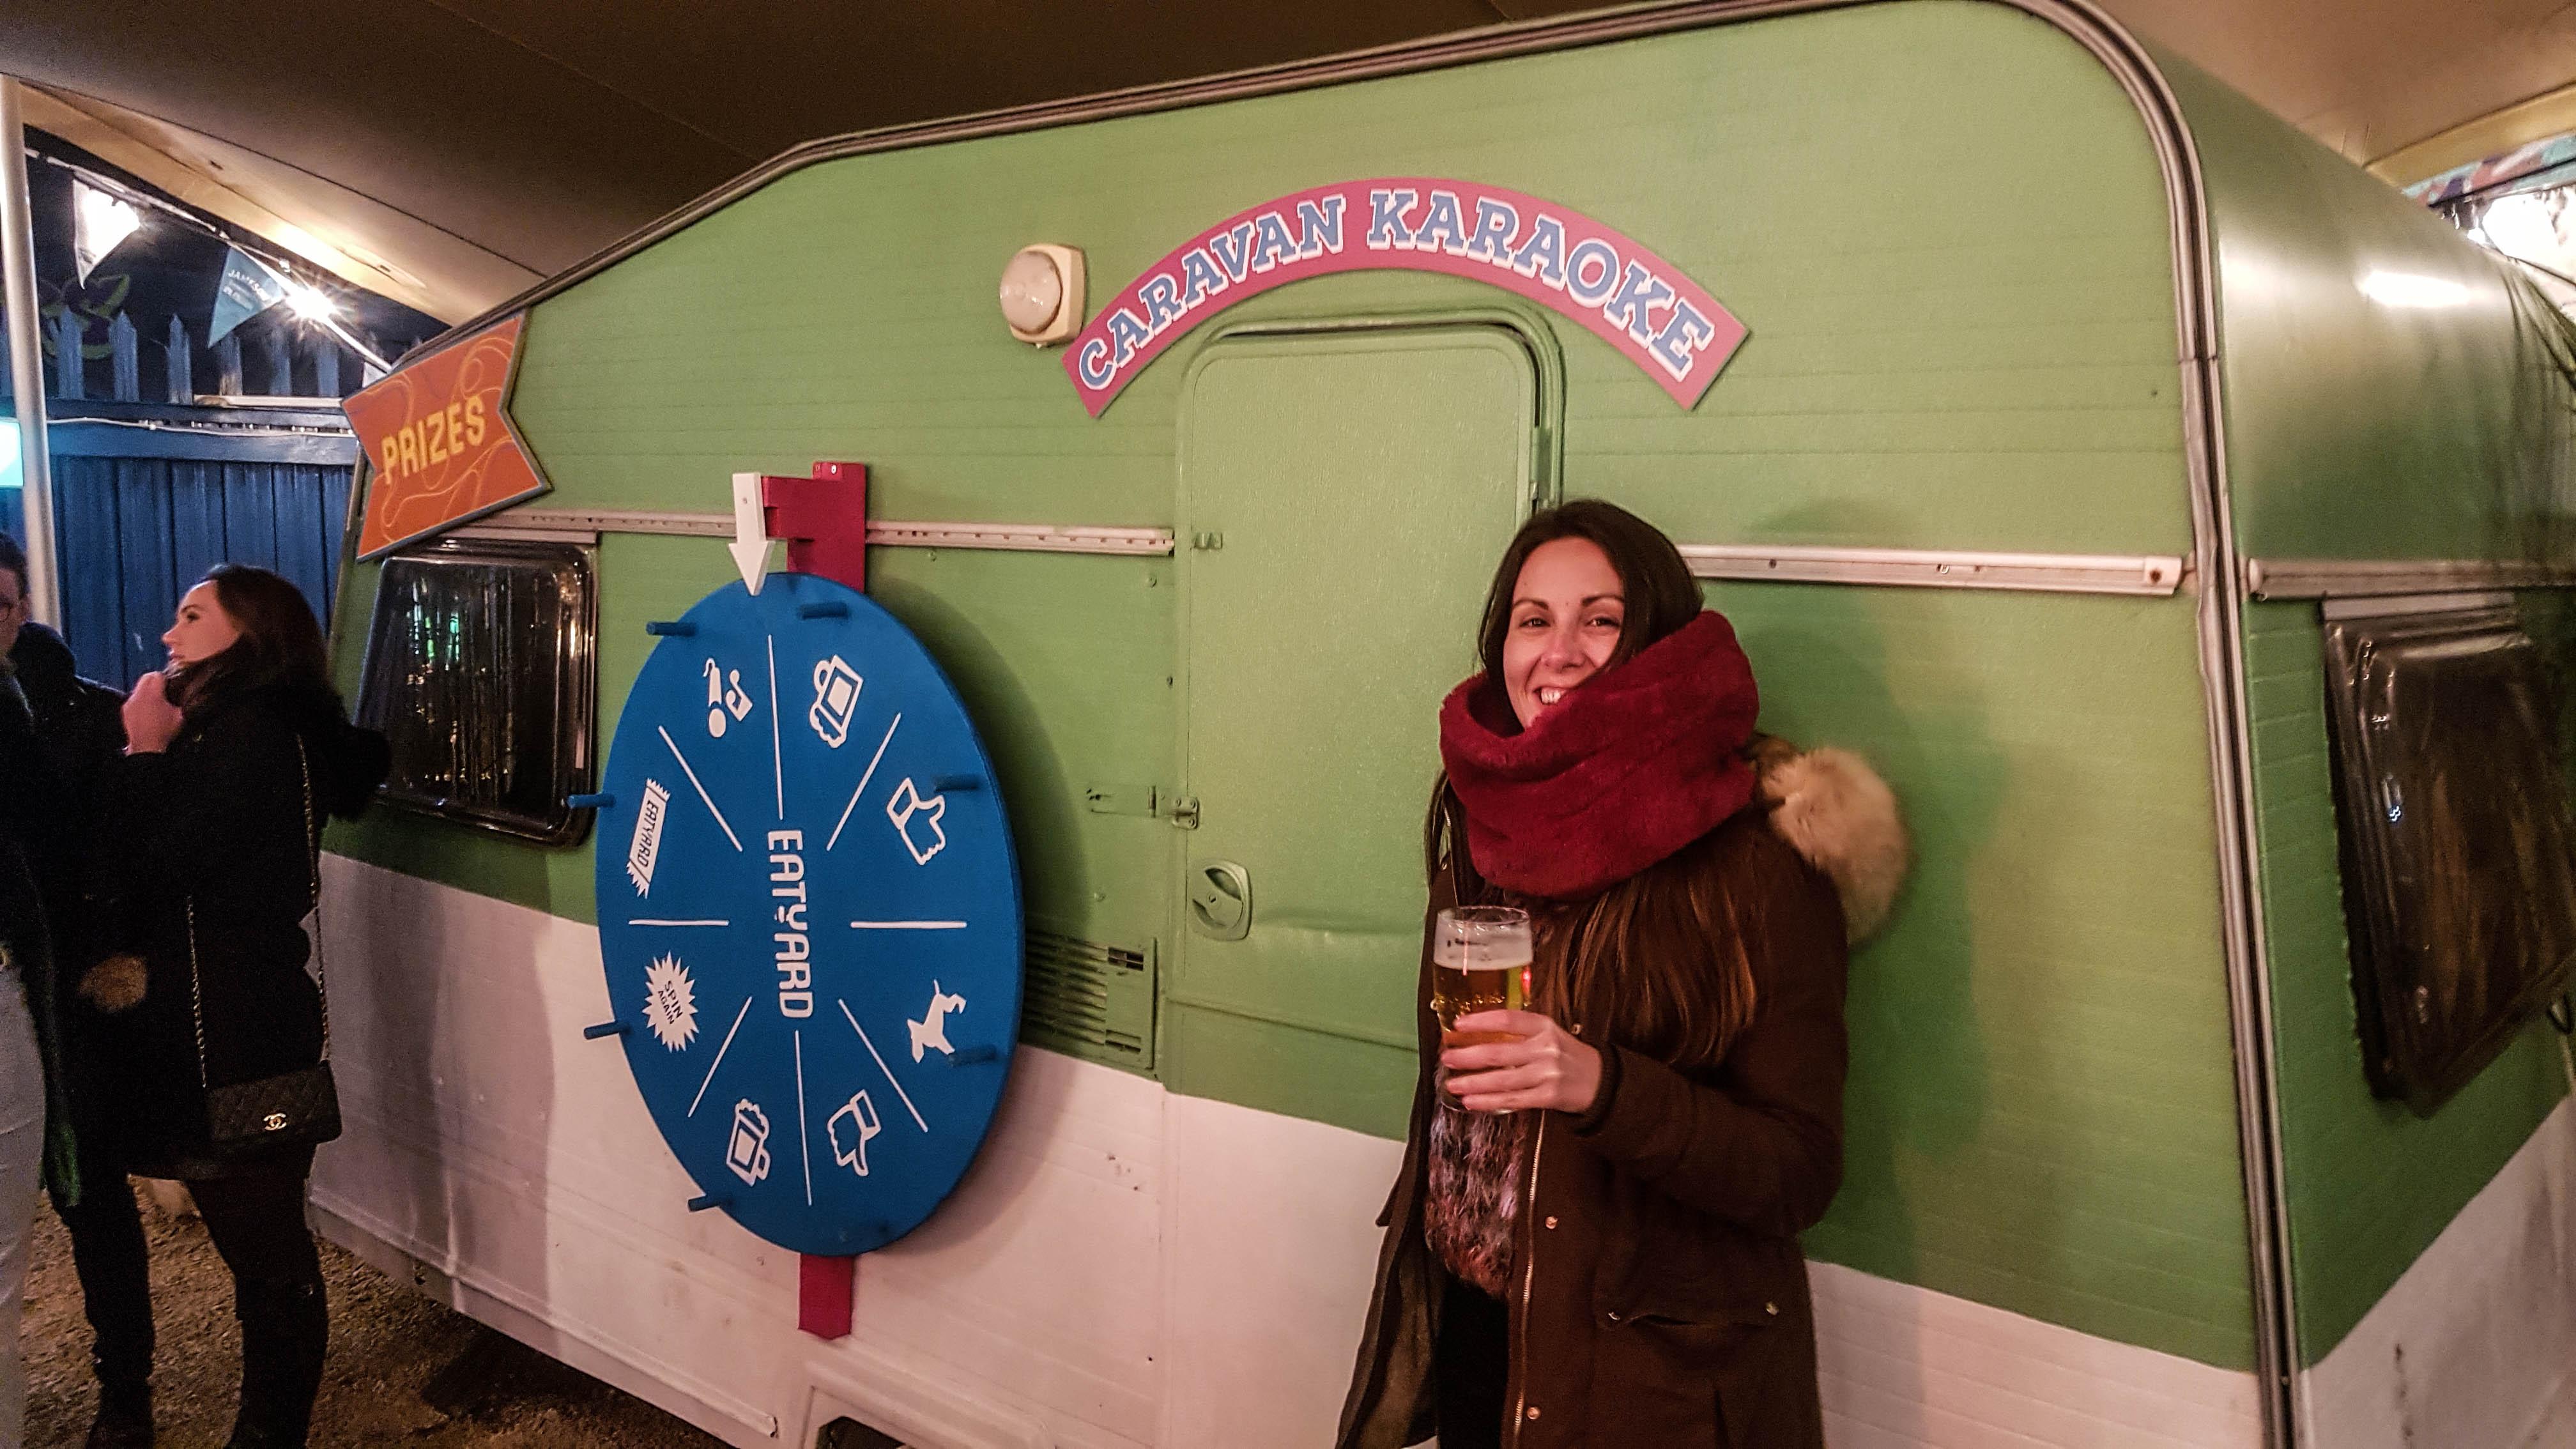 Caravan Karaoke en Eatyard, The Bernard Shaw, Dublín, Irlanda